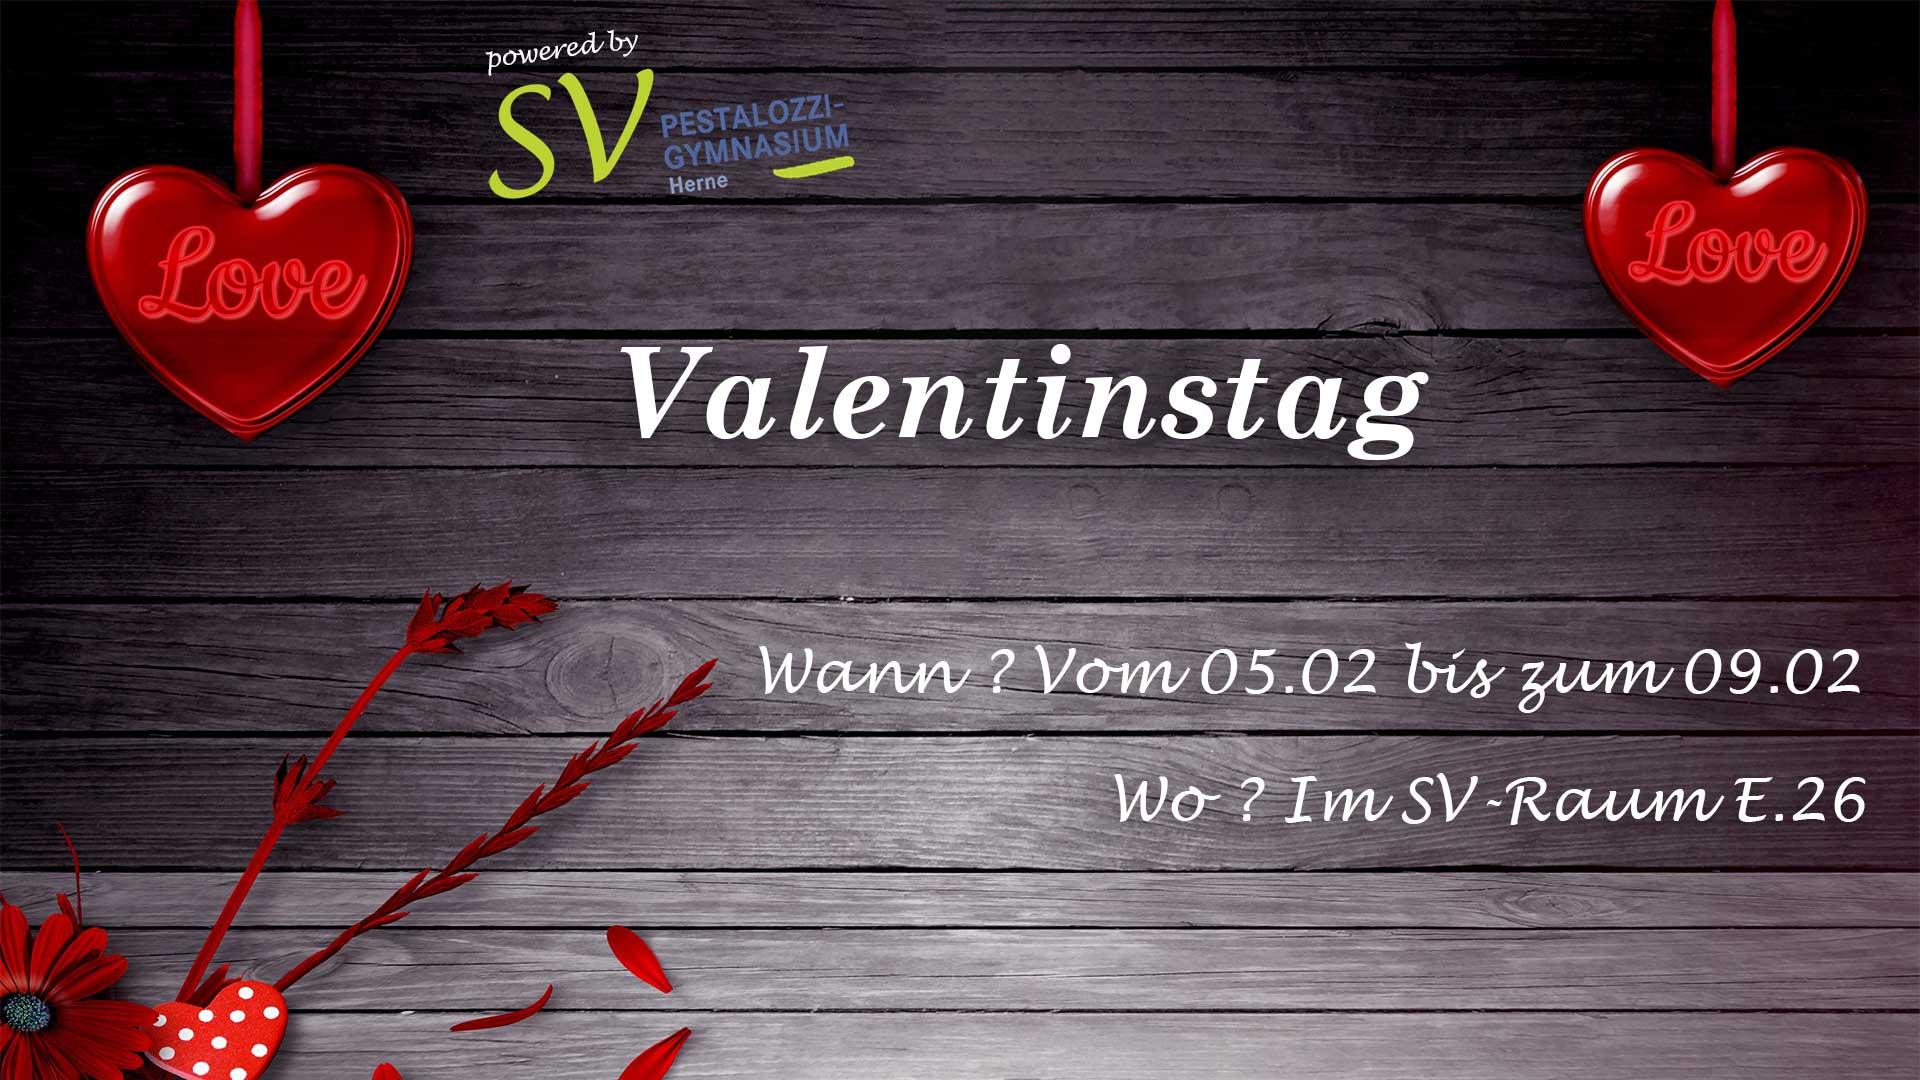 Sv Valentinstag